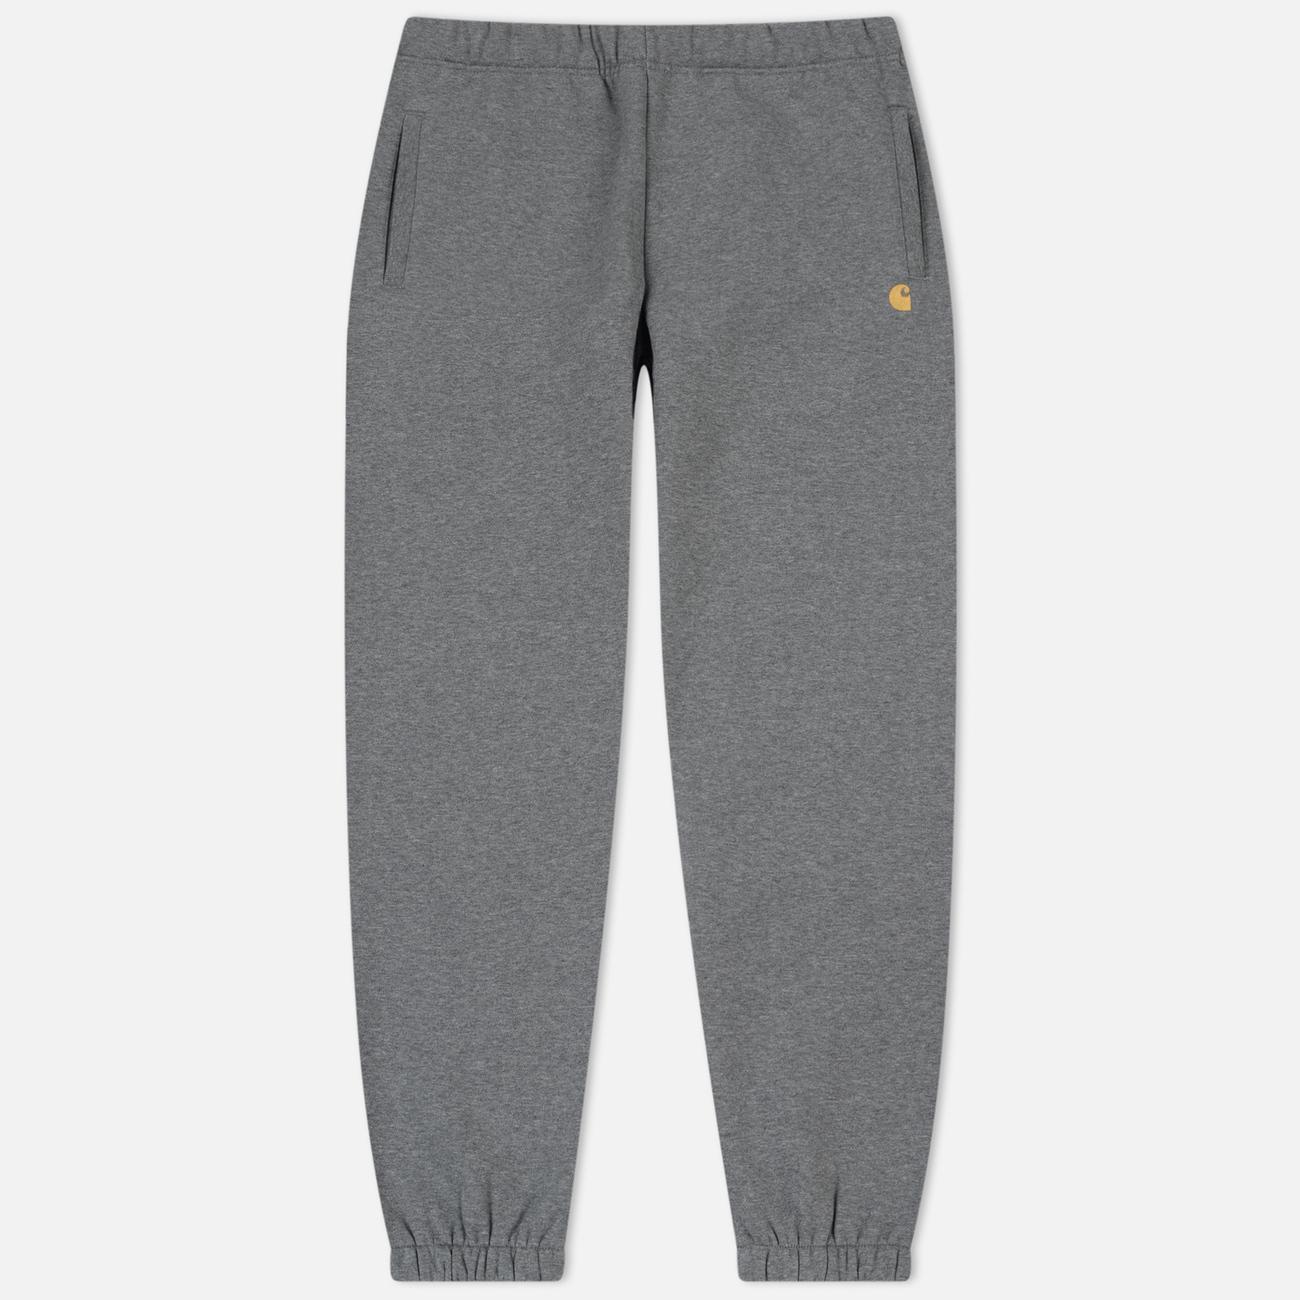 Мужские брюки Carhartt WIP Chase 13 Oz Dark Grey Heather/Gold